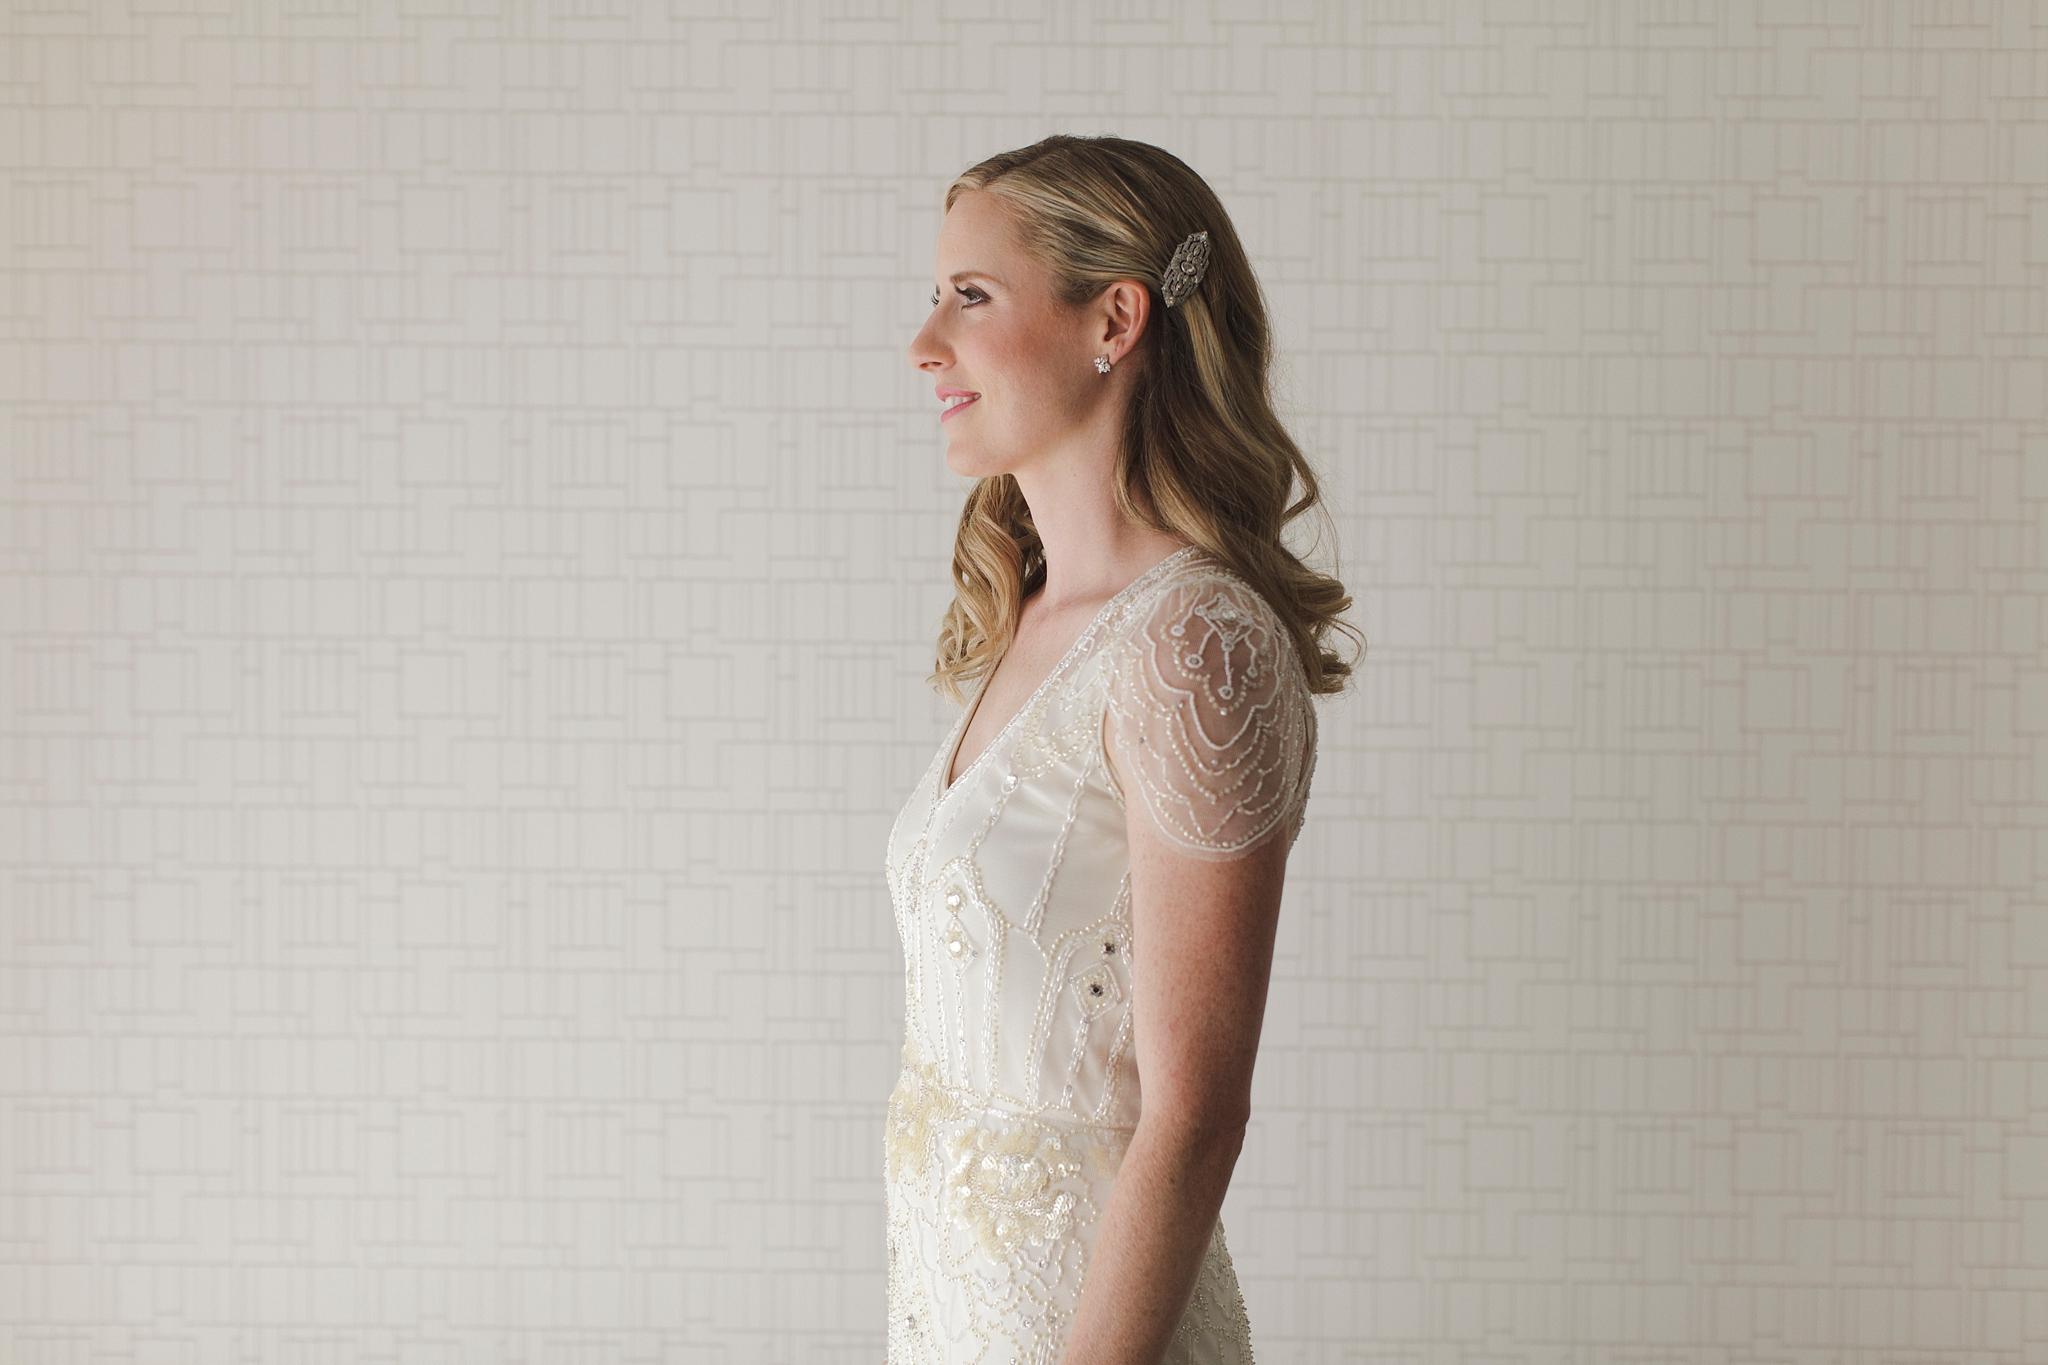 KateColin-WEDDING-highlights-2736.jpg